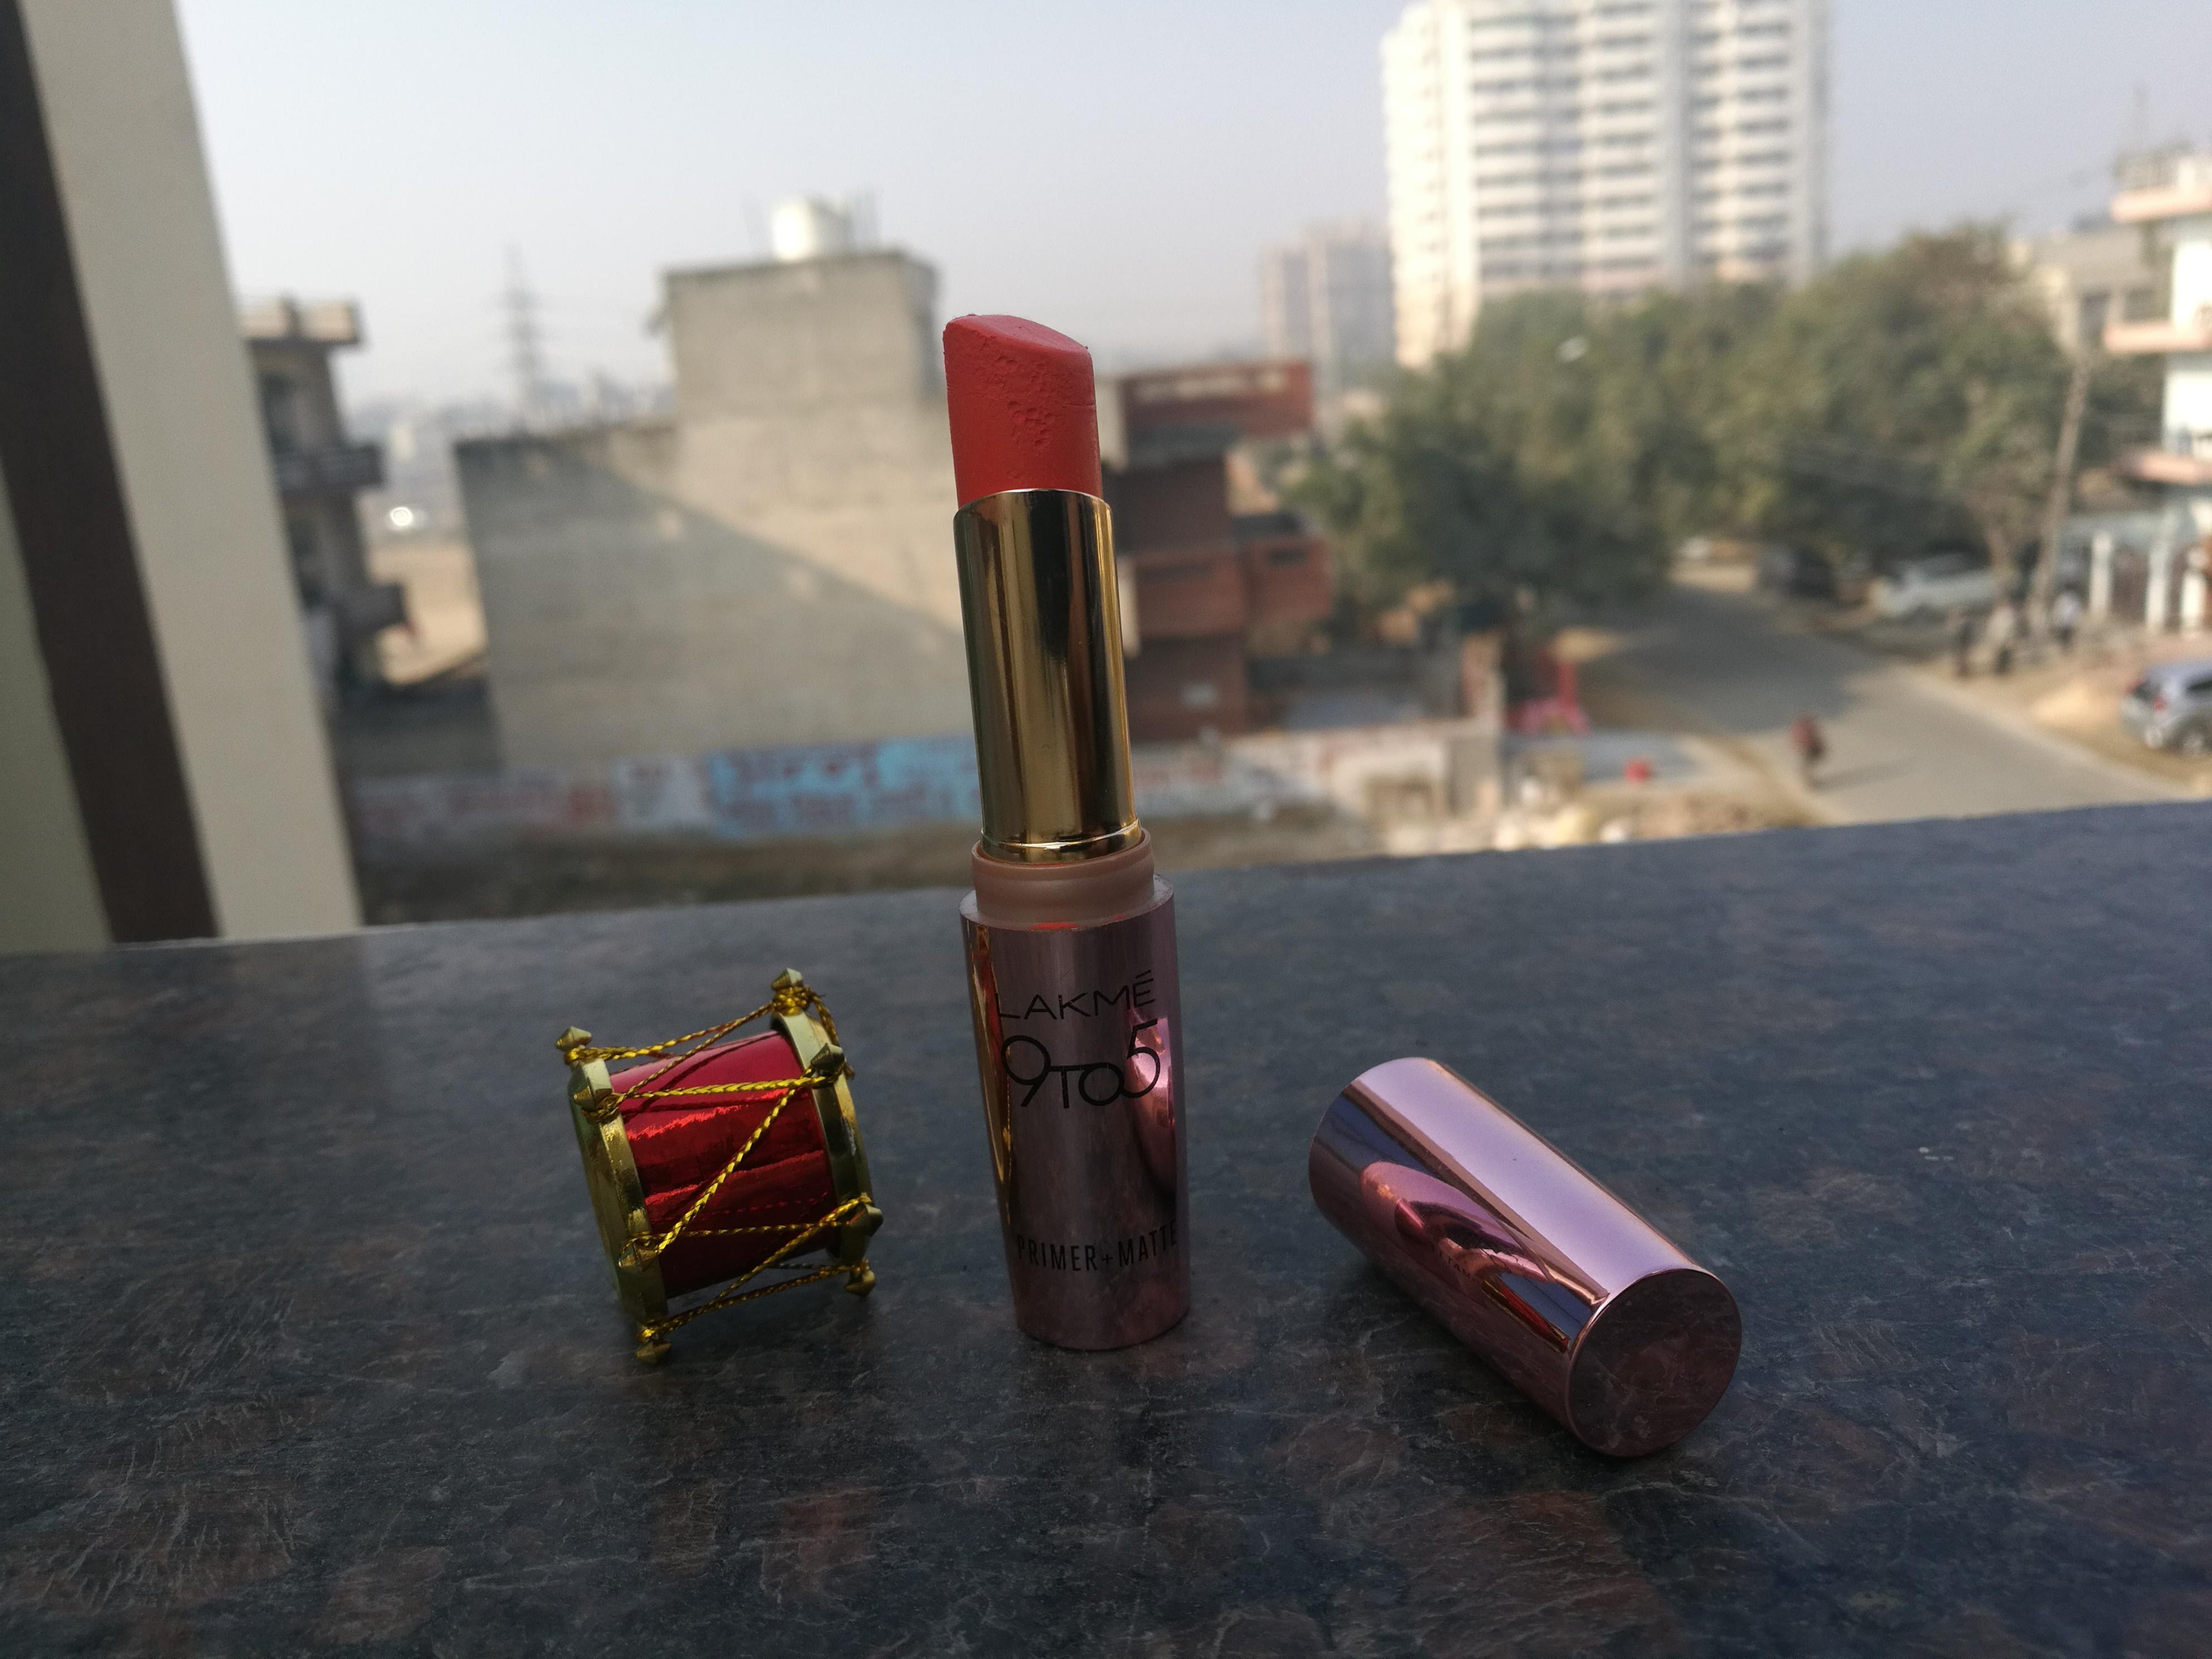 Lakme 9 To 5 Primer + Matte Lipstick Saffron Gossip (MR7): Review & Swatches